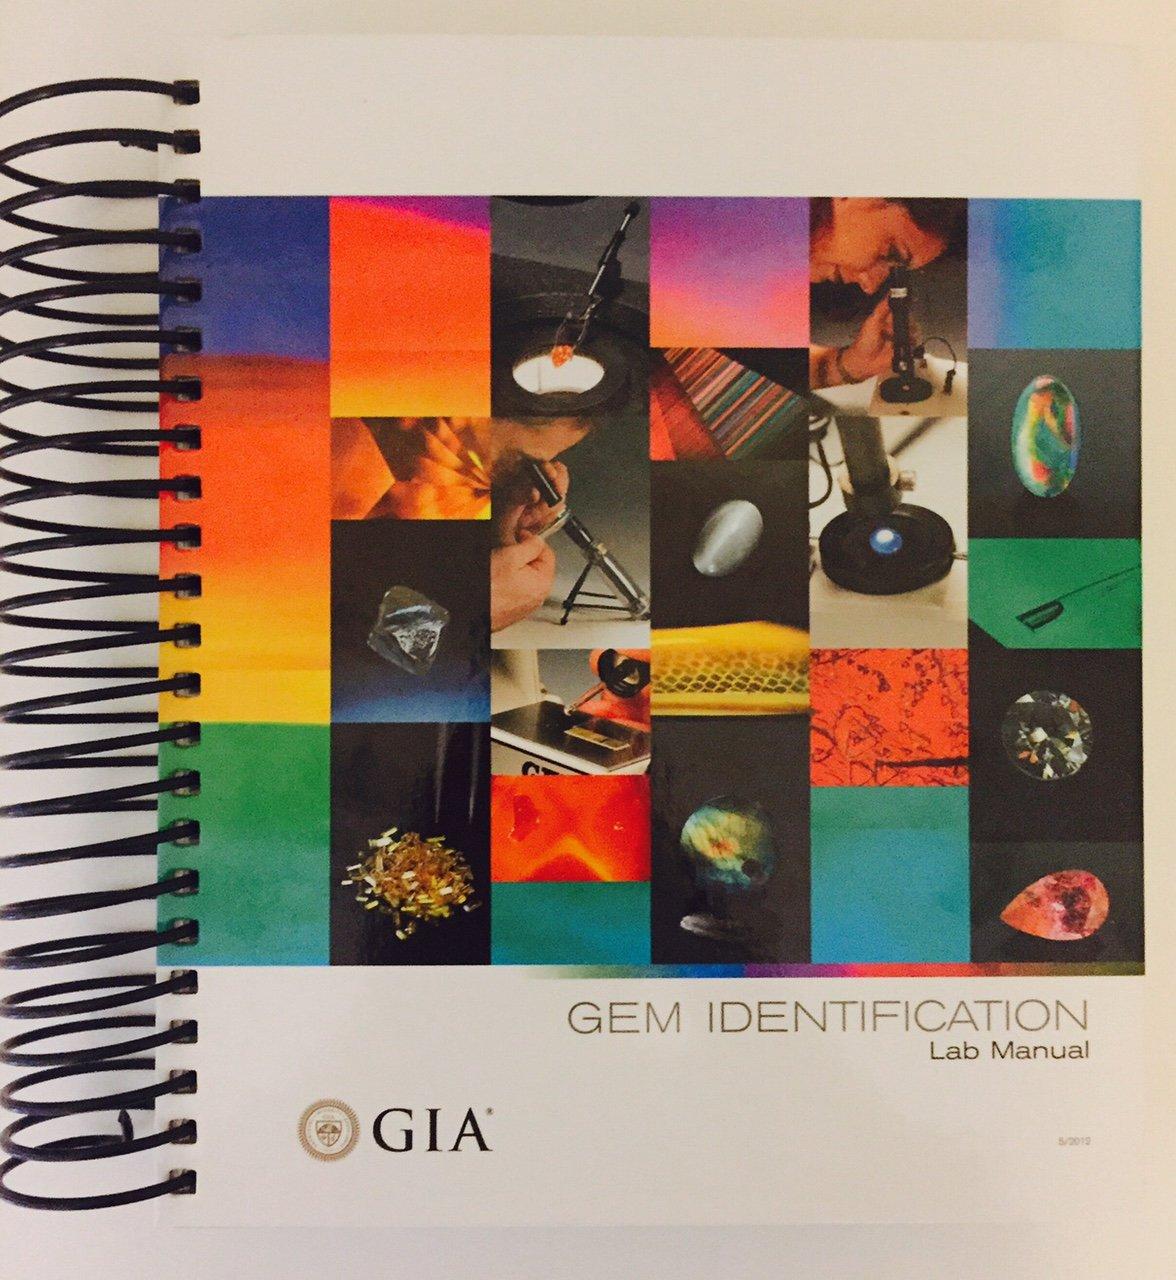 gia gem identification lab manual